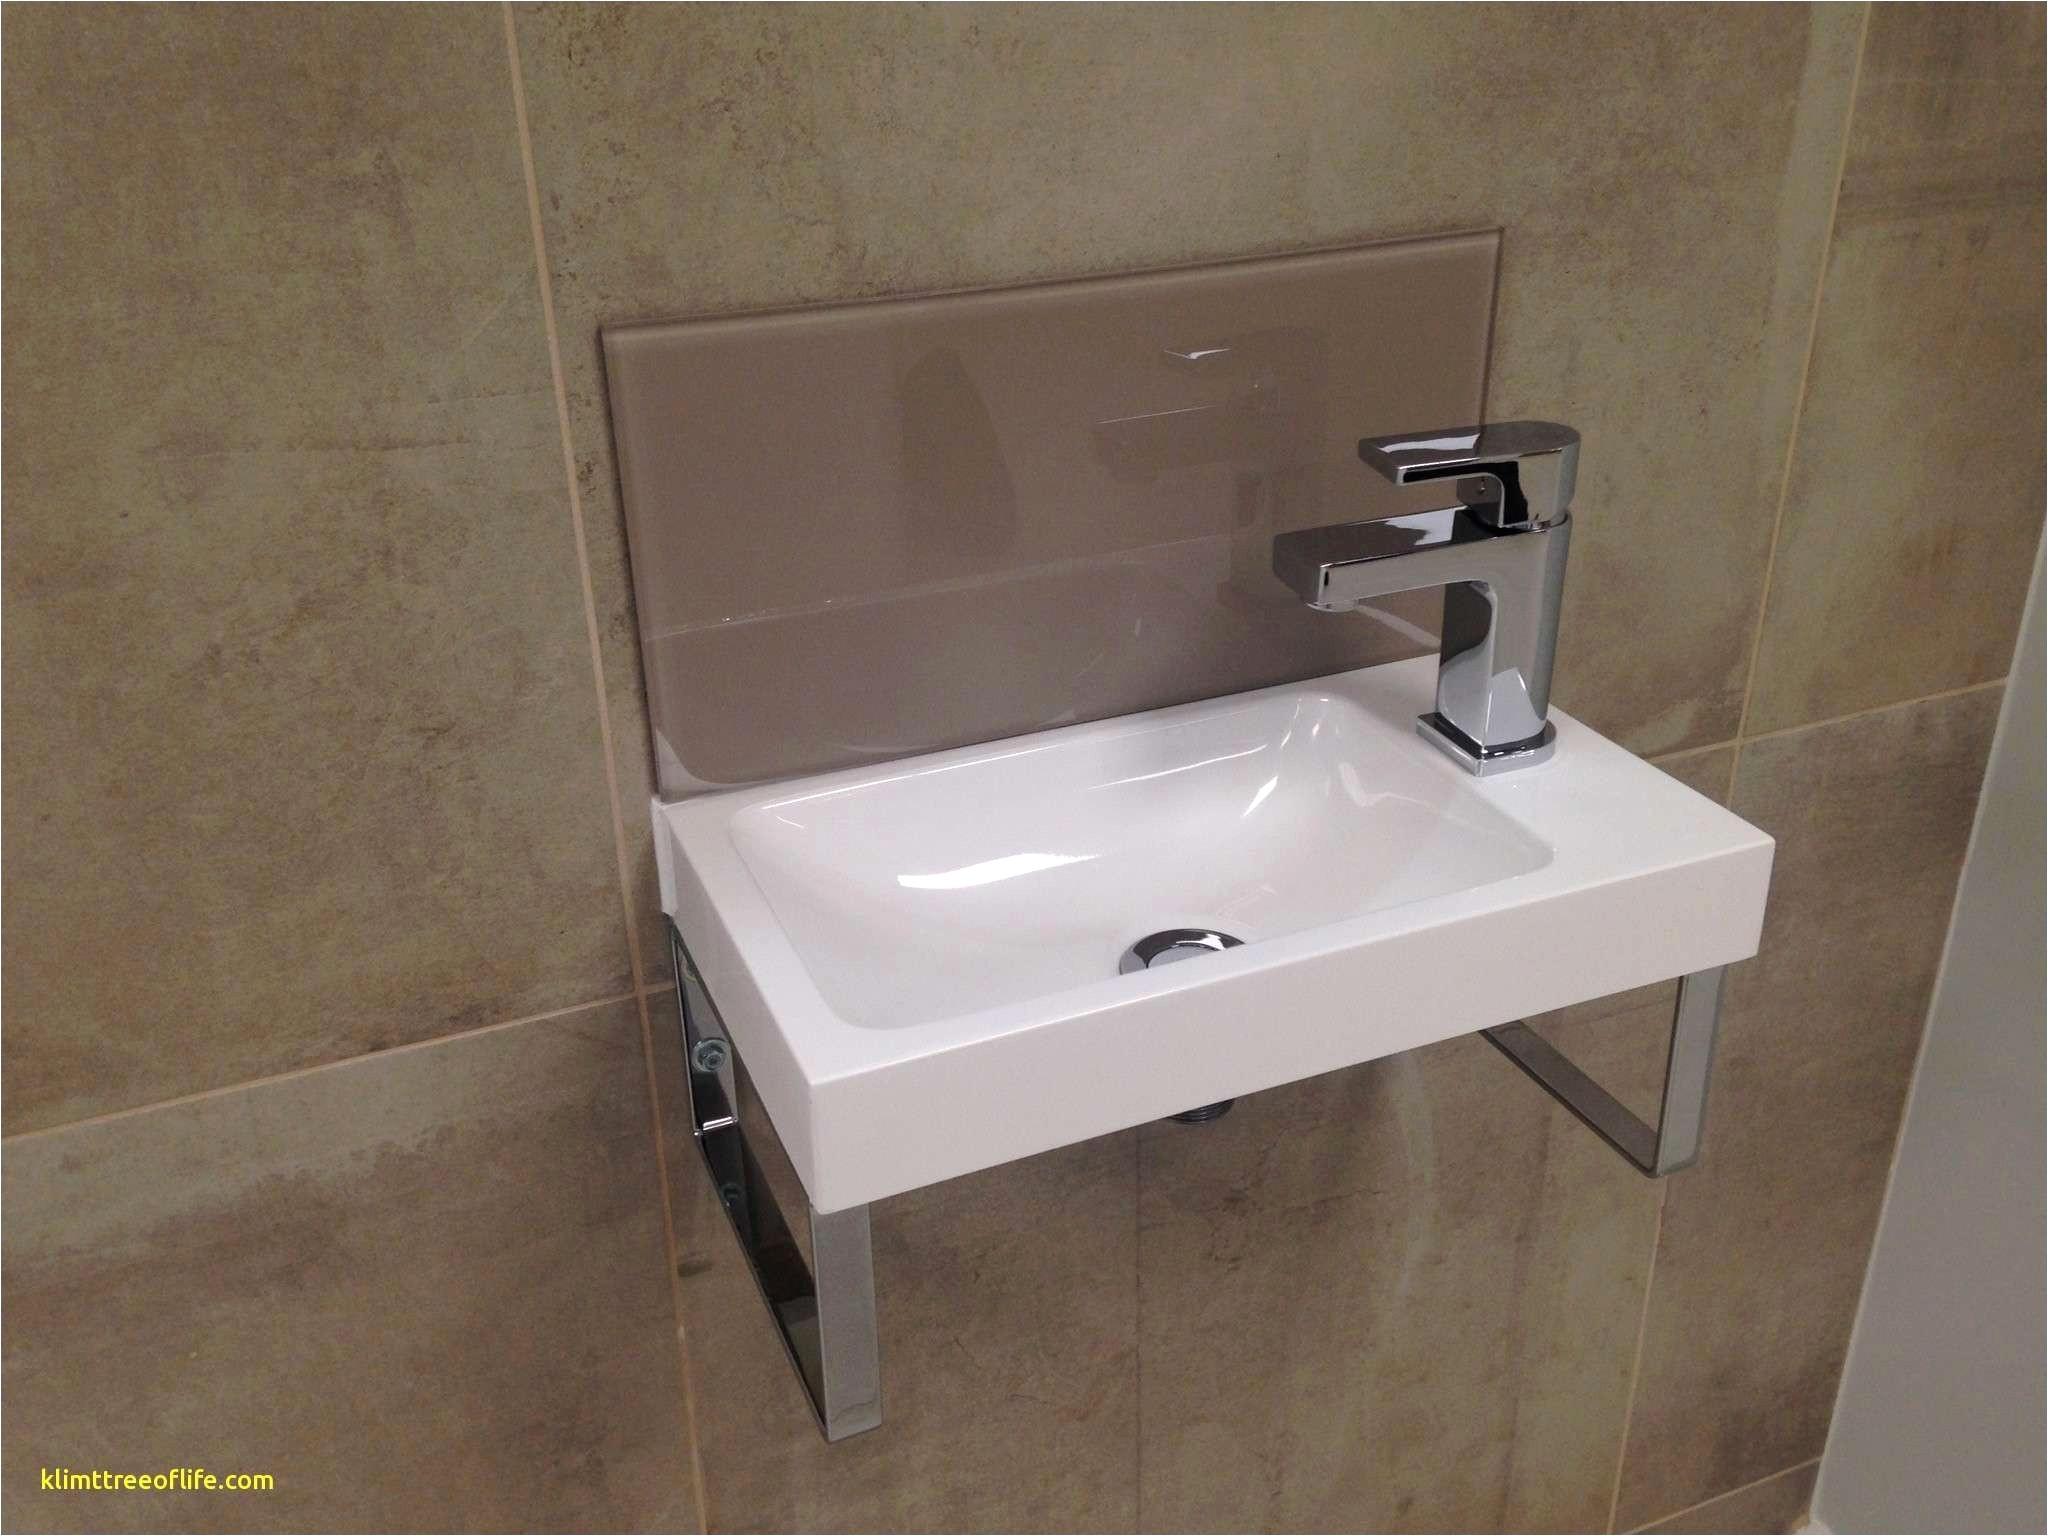 Bathroom Wall Decoration Ideas 2019 Fresh Bathroom Picture Ideas Lovely Tag Toilet Ideas 0d Best Scheme